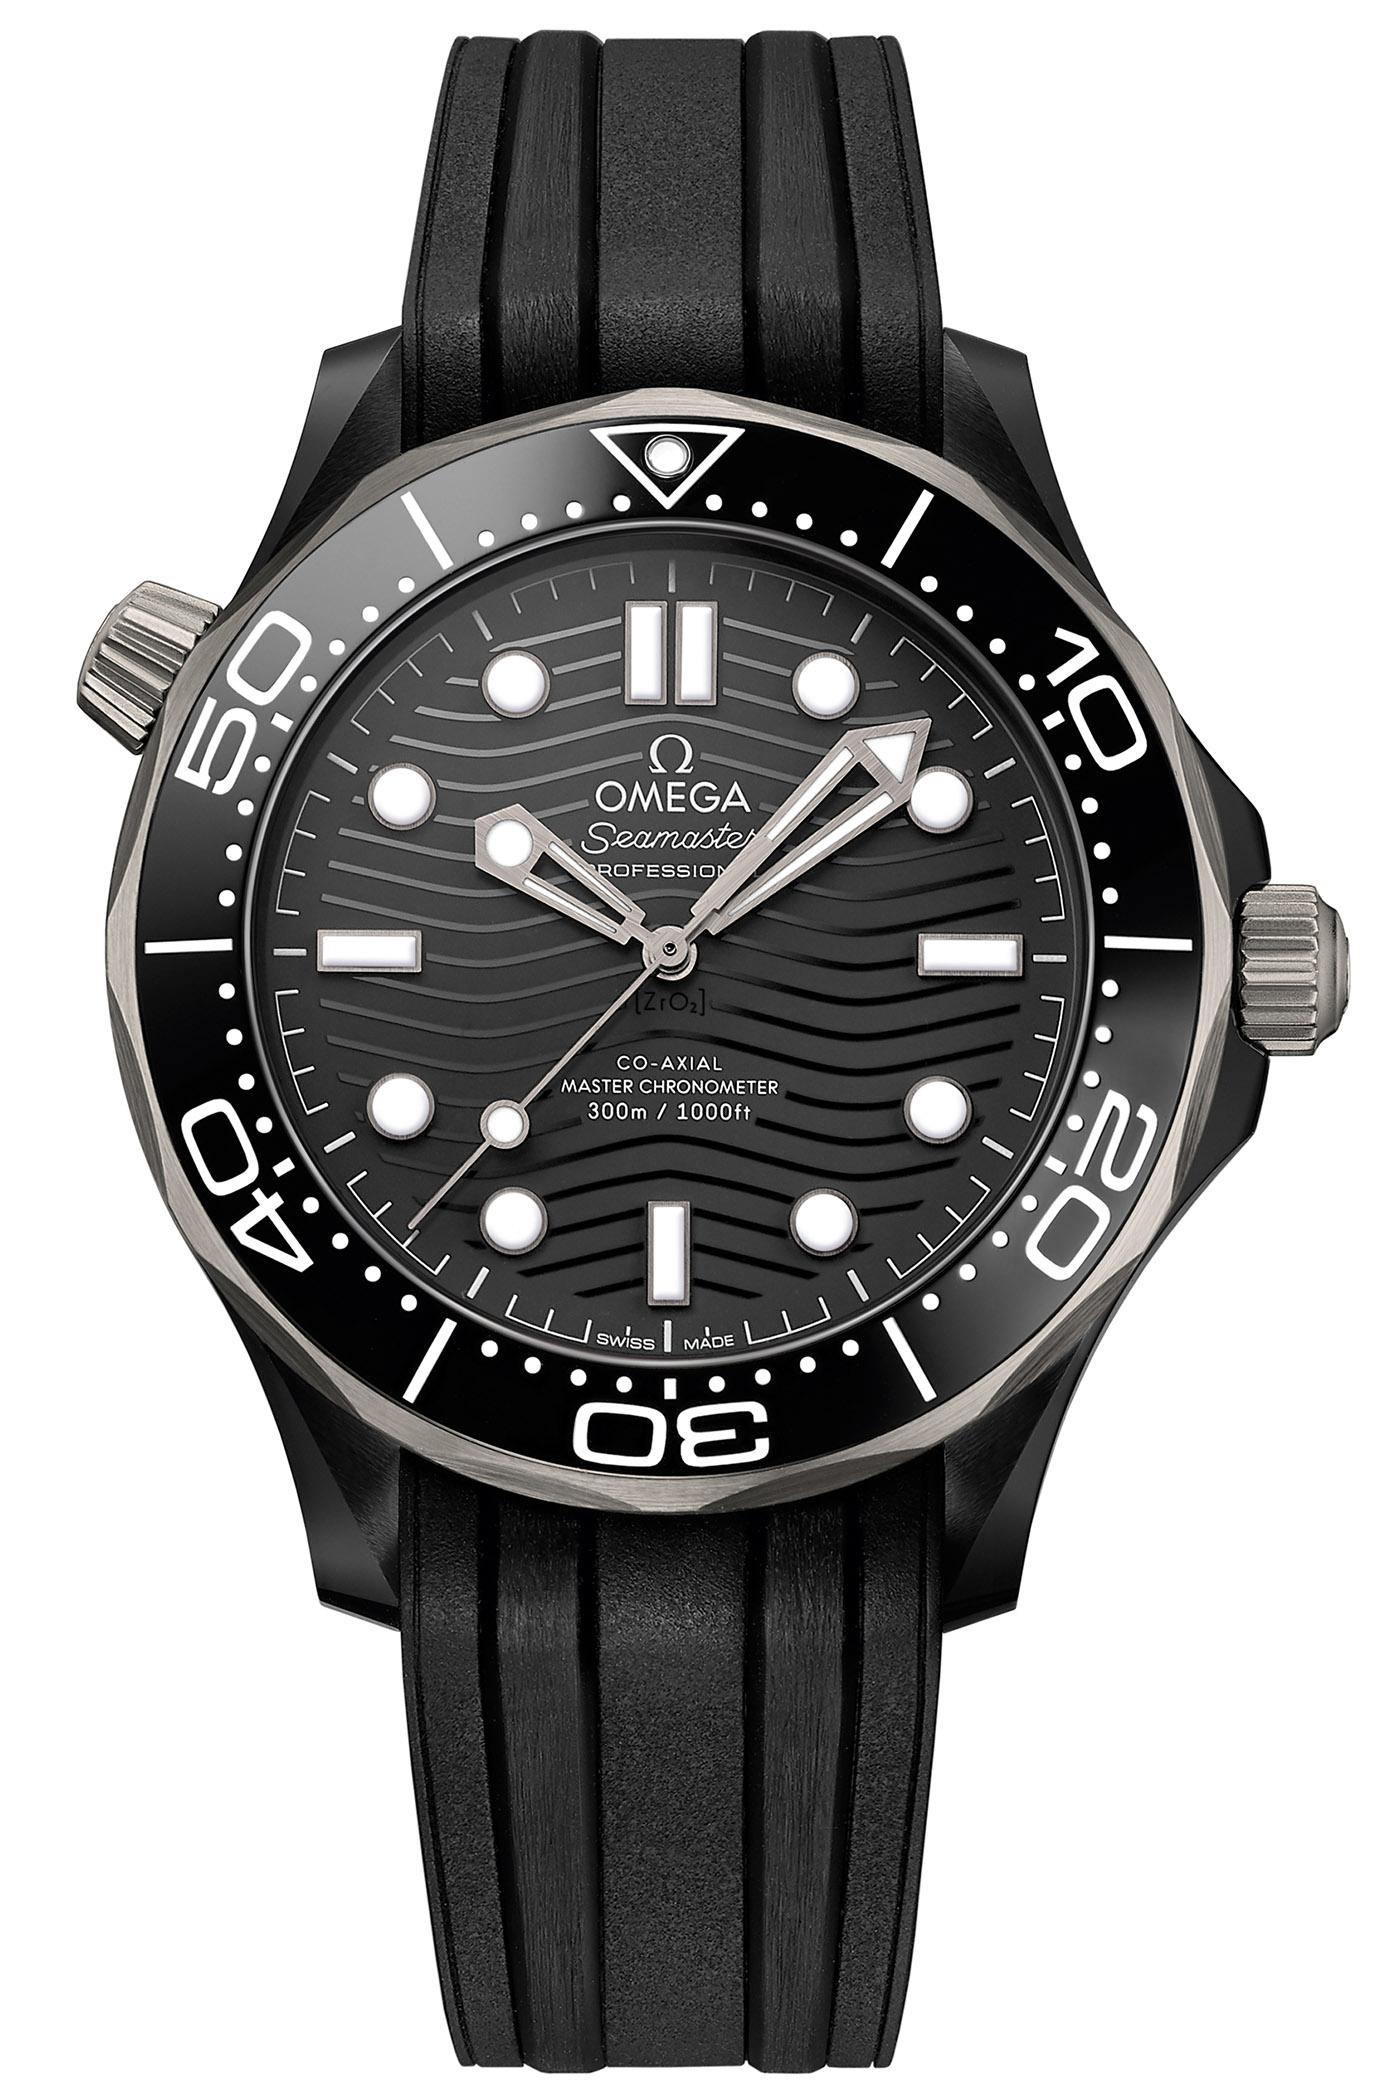 Name:  Omega-Seamaster-Diver-300M-Ceramic-and-Titanium-210.92.44.20.01.001-collection-2019-1.jpg Views: 313 Size:  412.4 KB